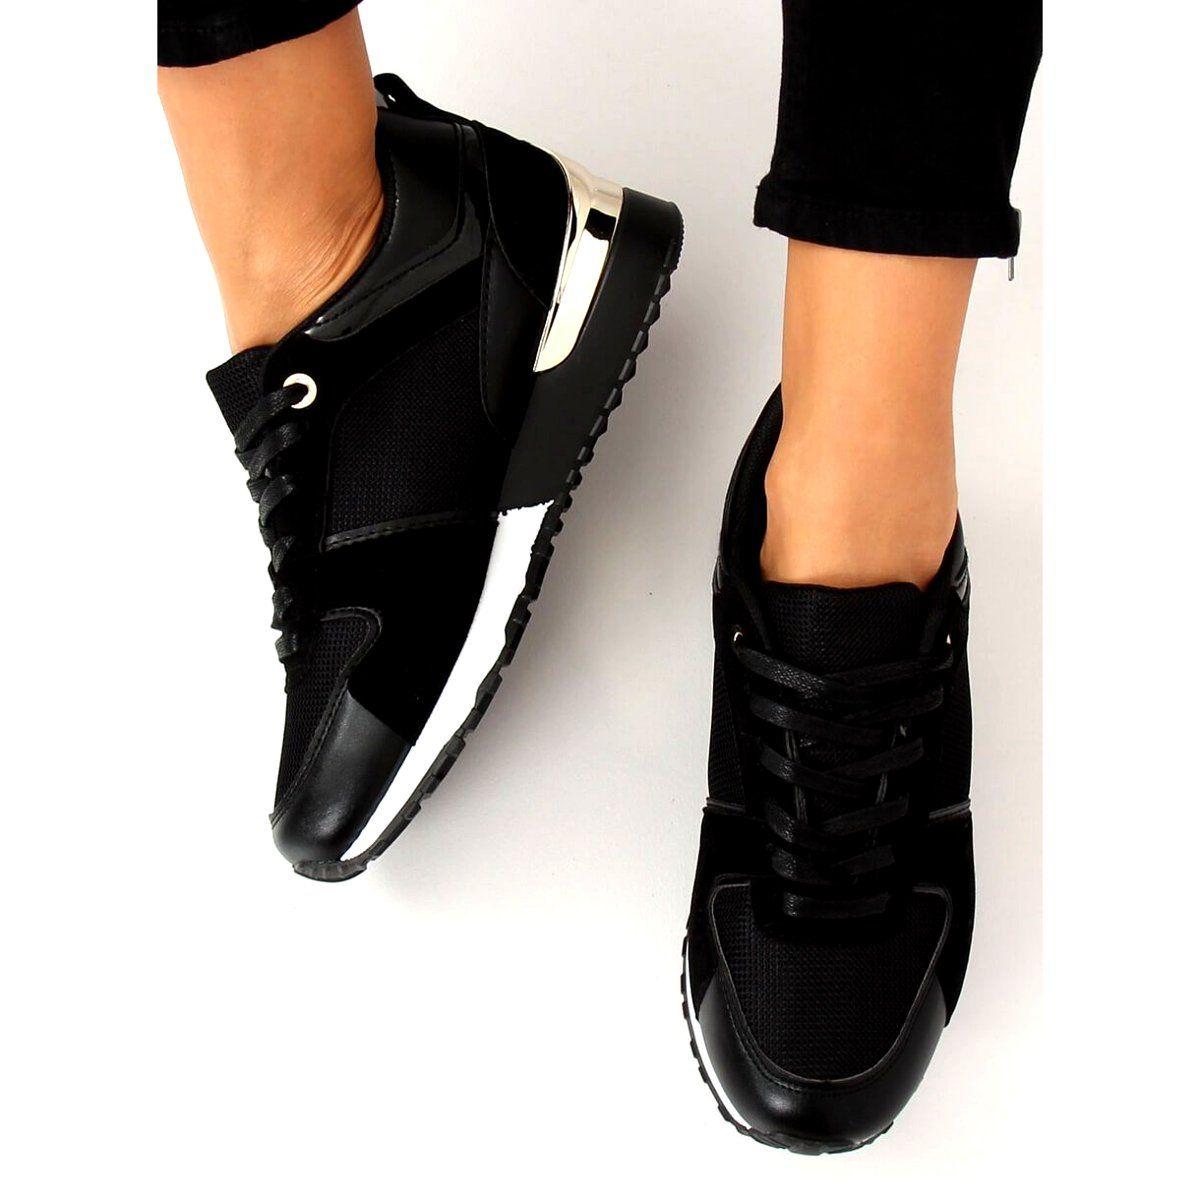 Buty Sportowe Czarne B 01 Black Air Max Sneakers Sneakers Nike Nike Air Max